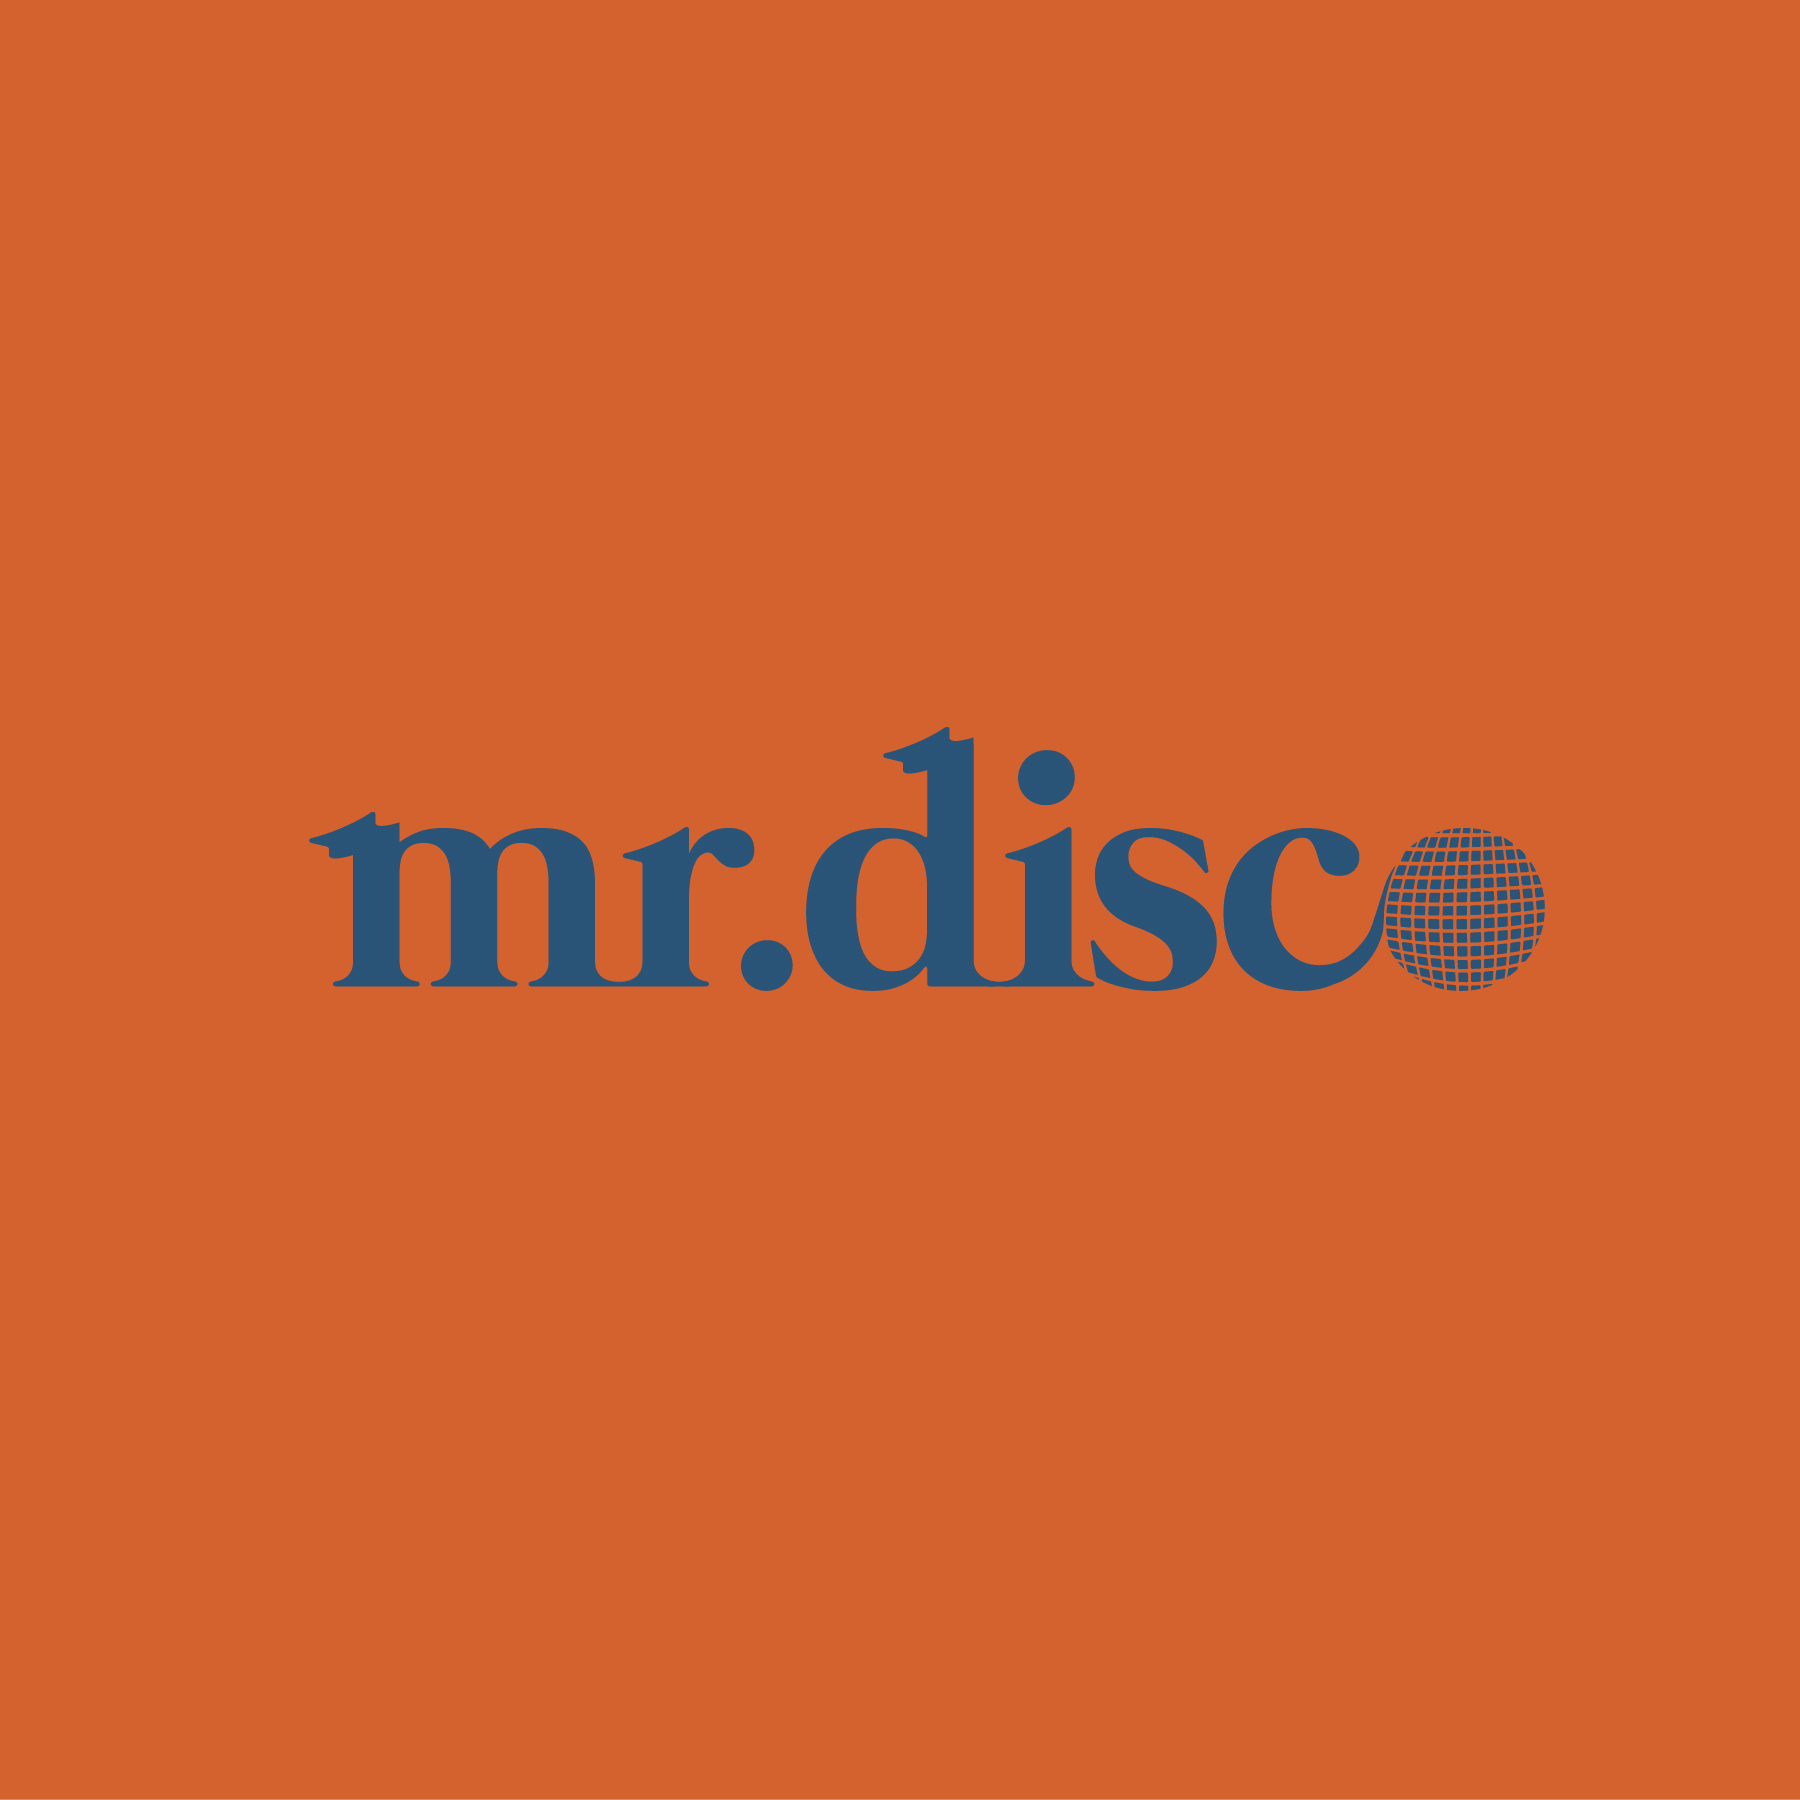 mr.disco_blue_insta-02.jpg